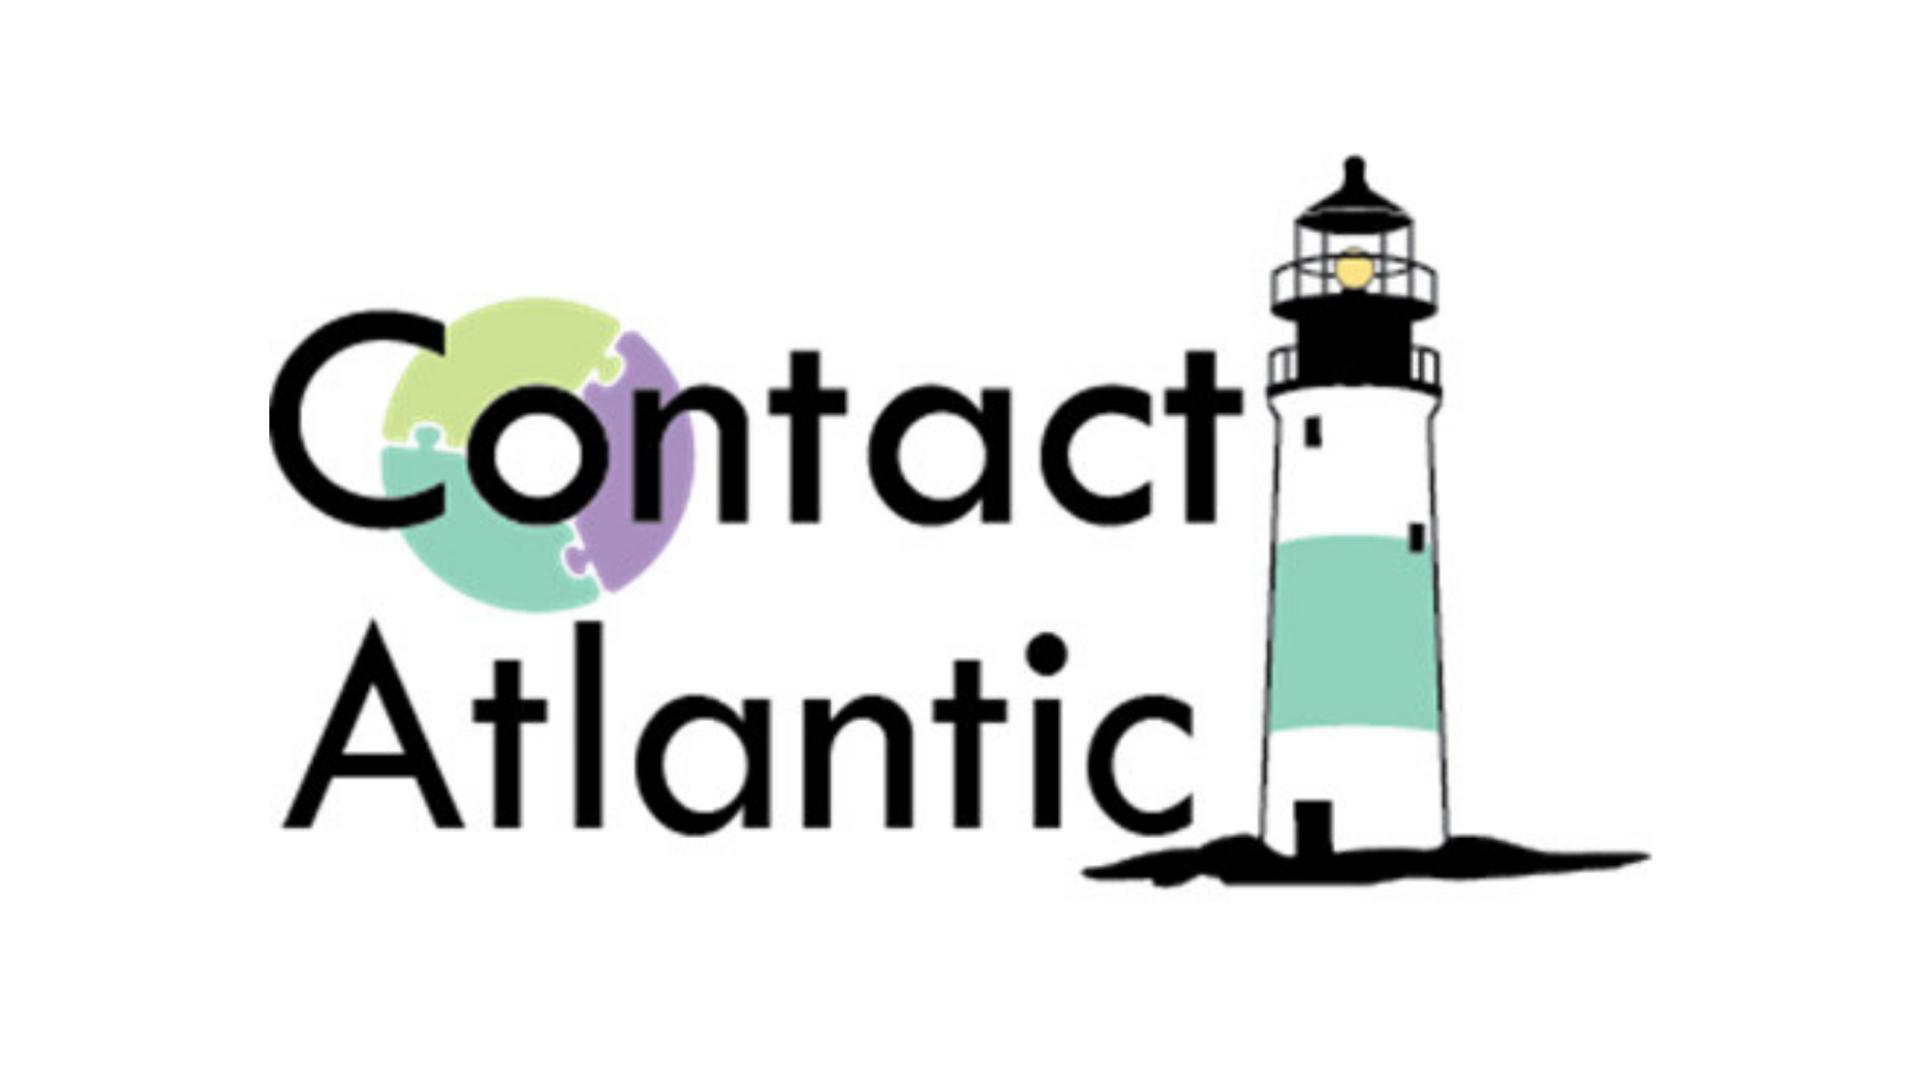 Contact Atlantic Event Graphic